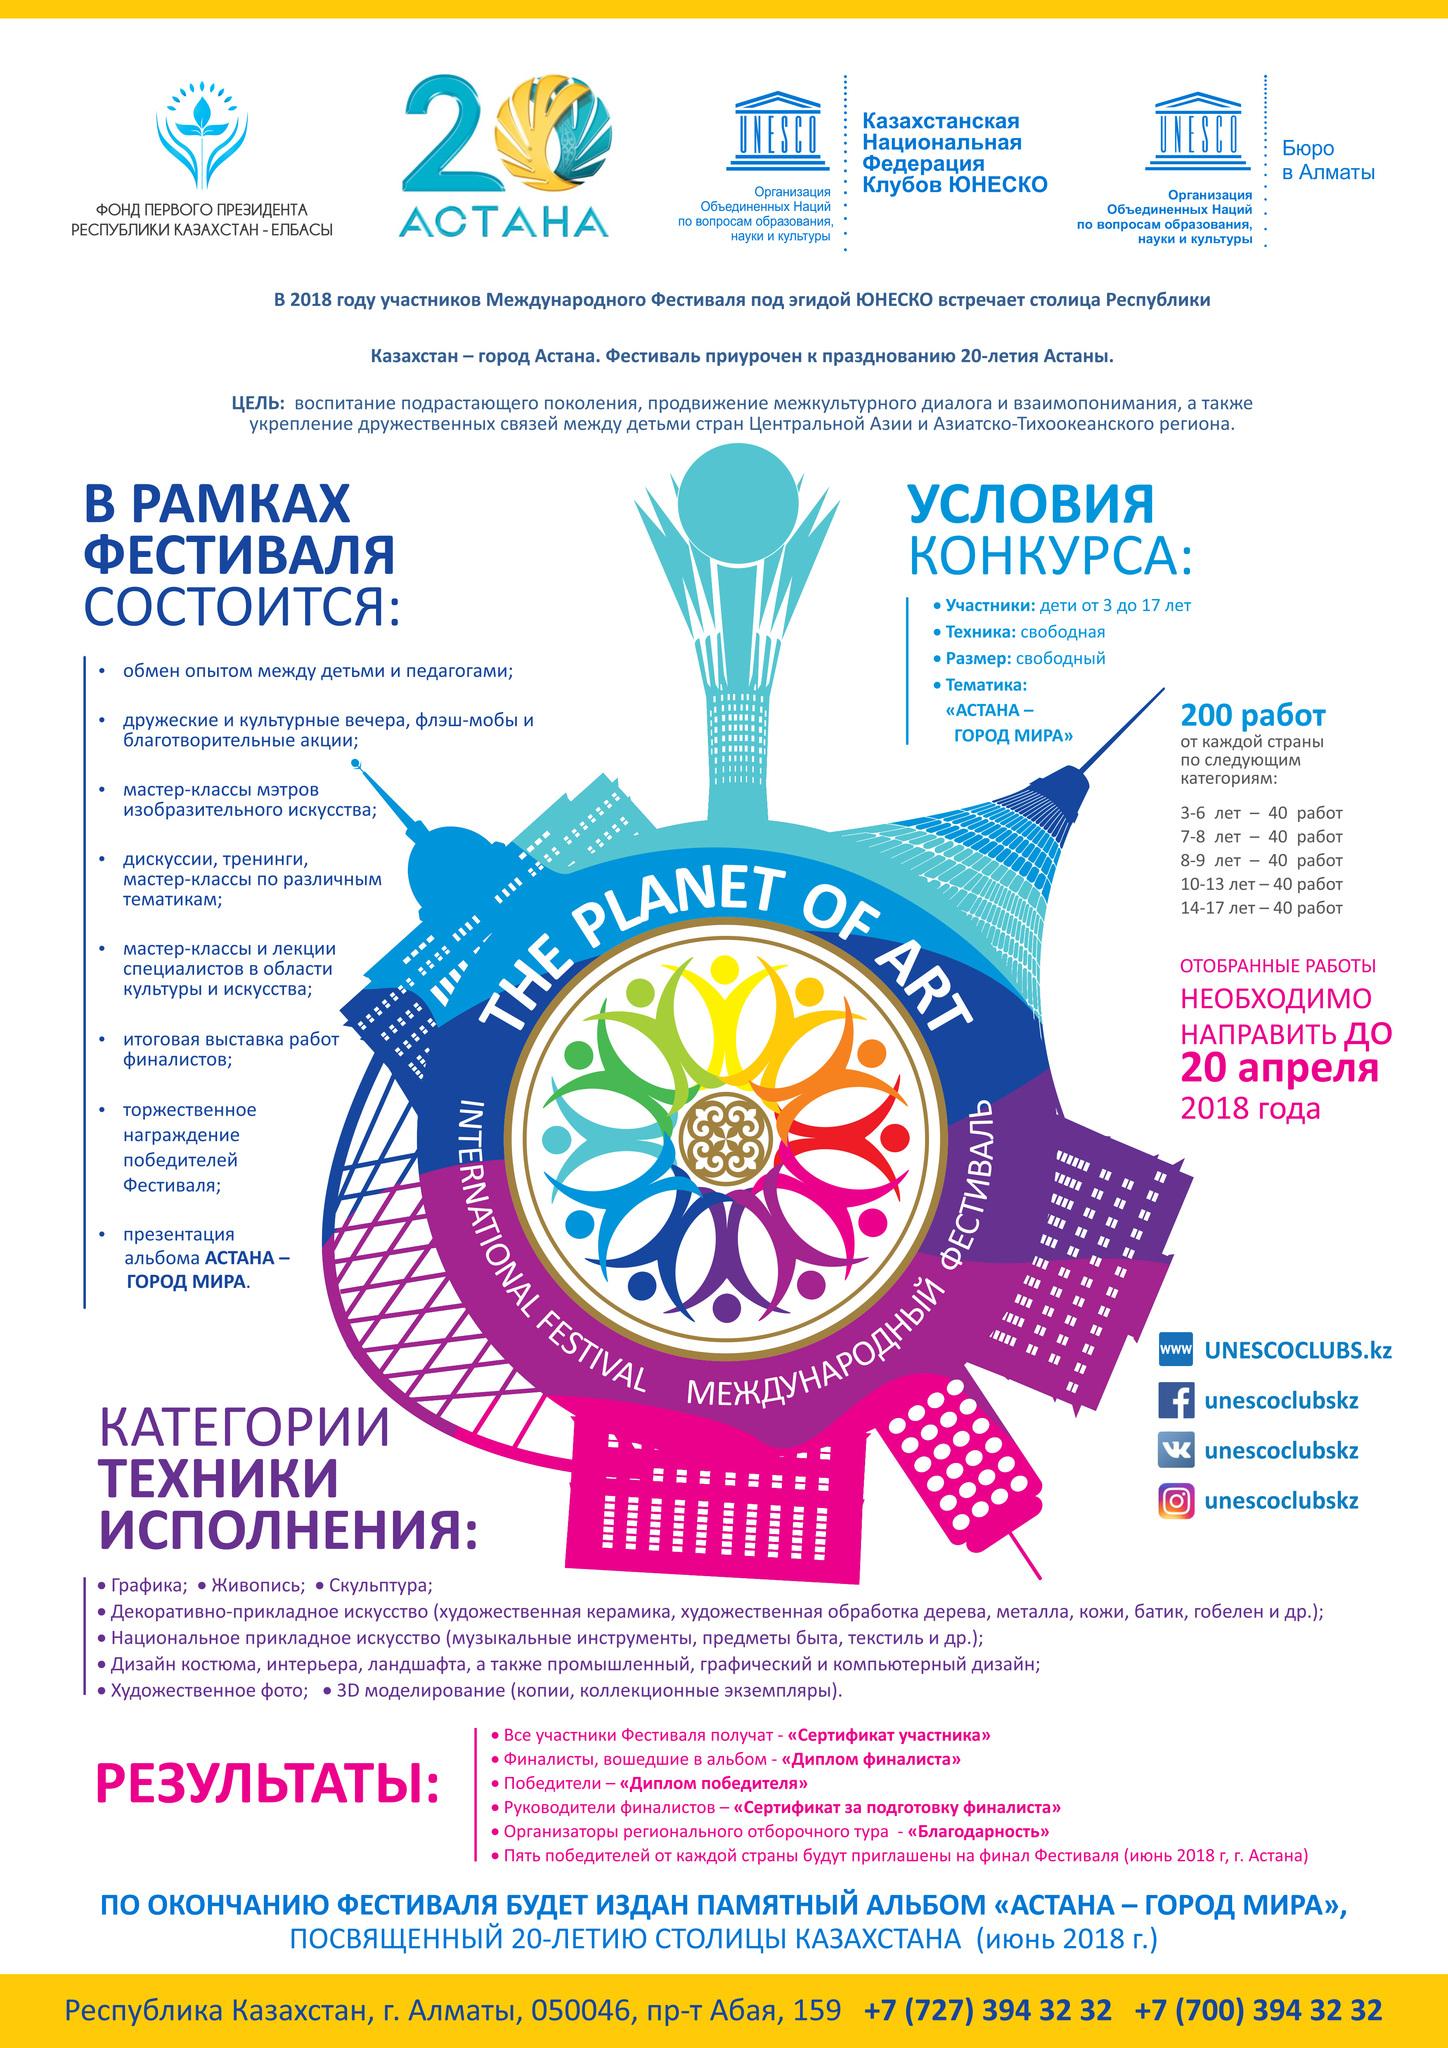 Астана - город мира